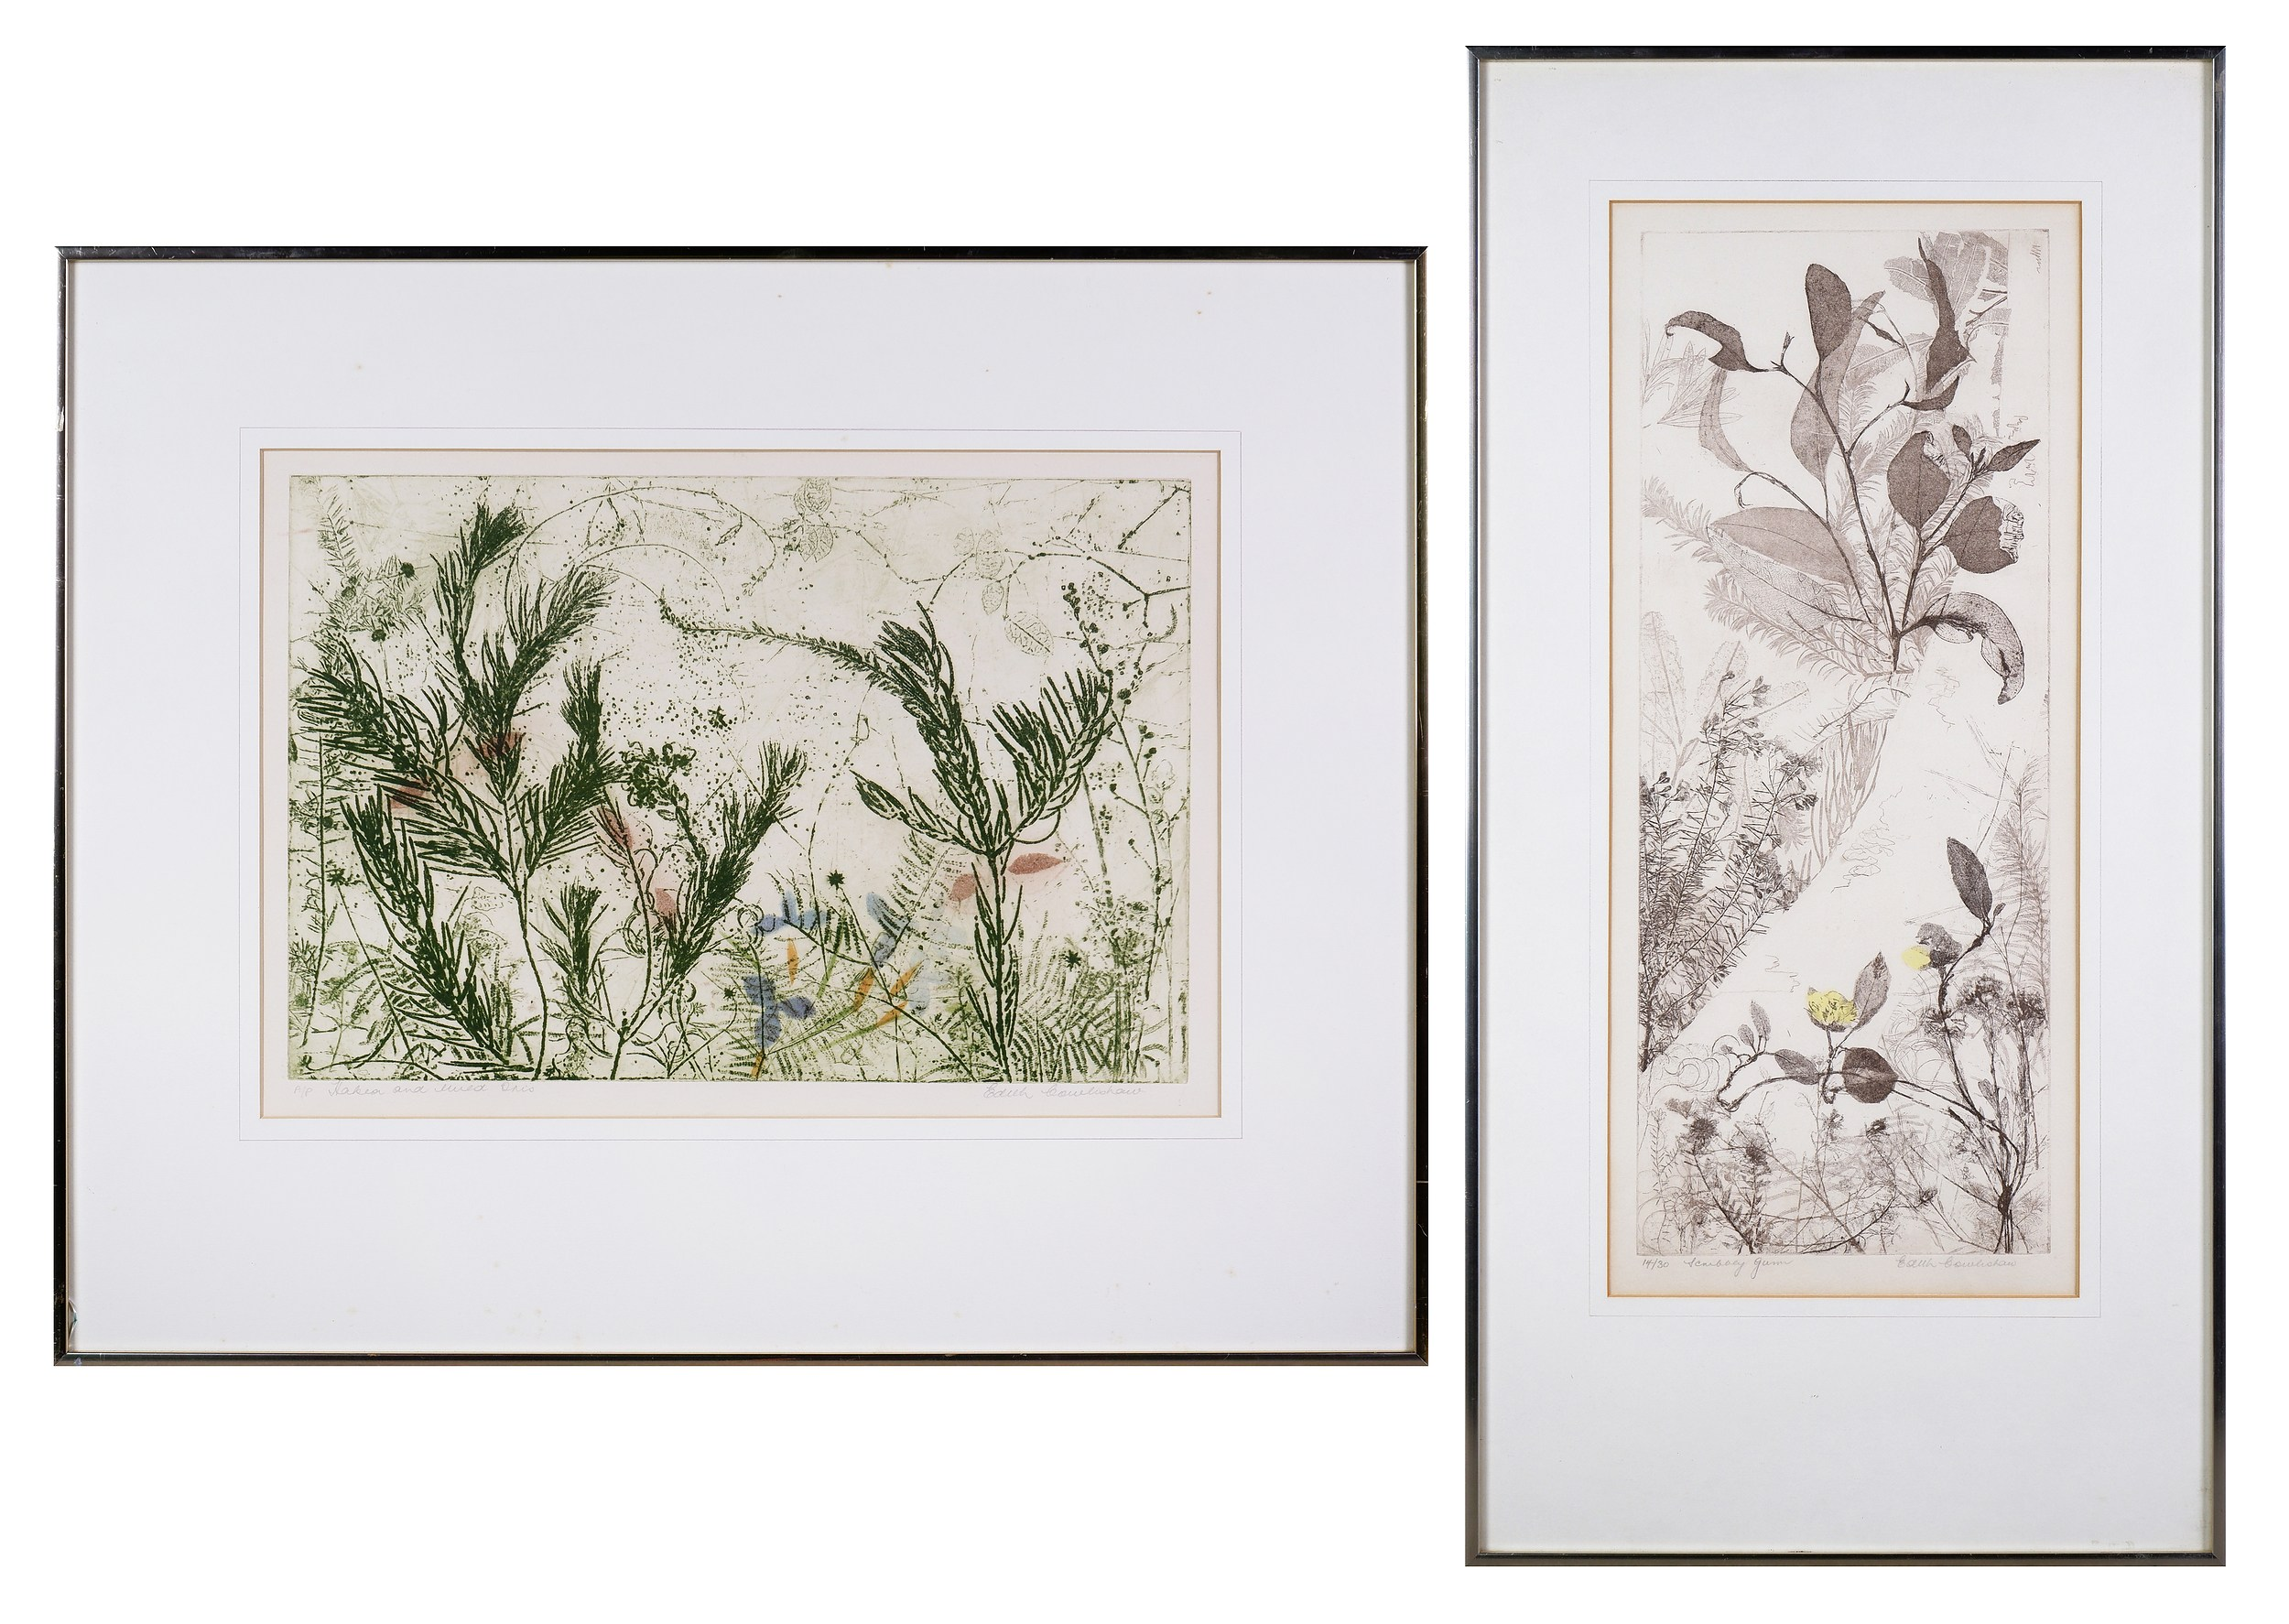 'Edith Cowlishaw (born 1924), Scrubby Gum, Etching; Hakea and Iris, Woodcut, largest 50 x 20 cm (2)'